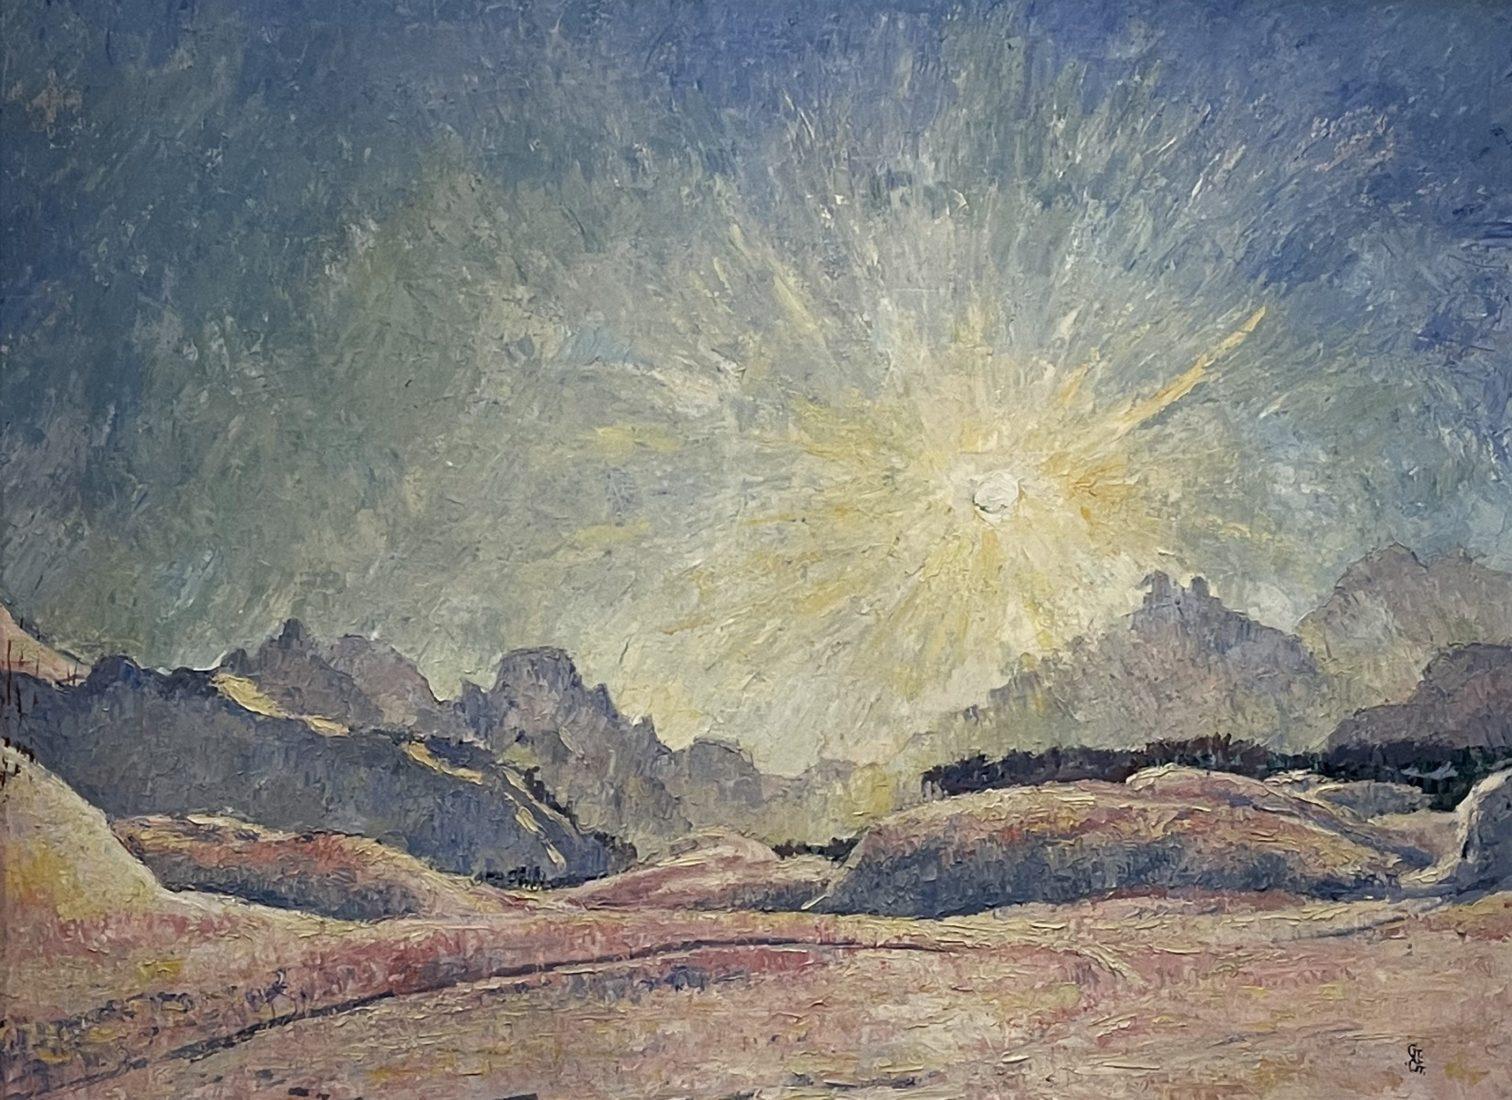 Giovanni Giacometti : Paysage de neige (soleil),